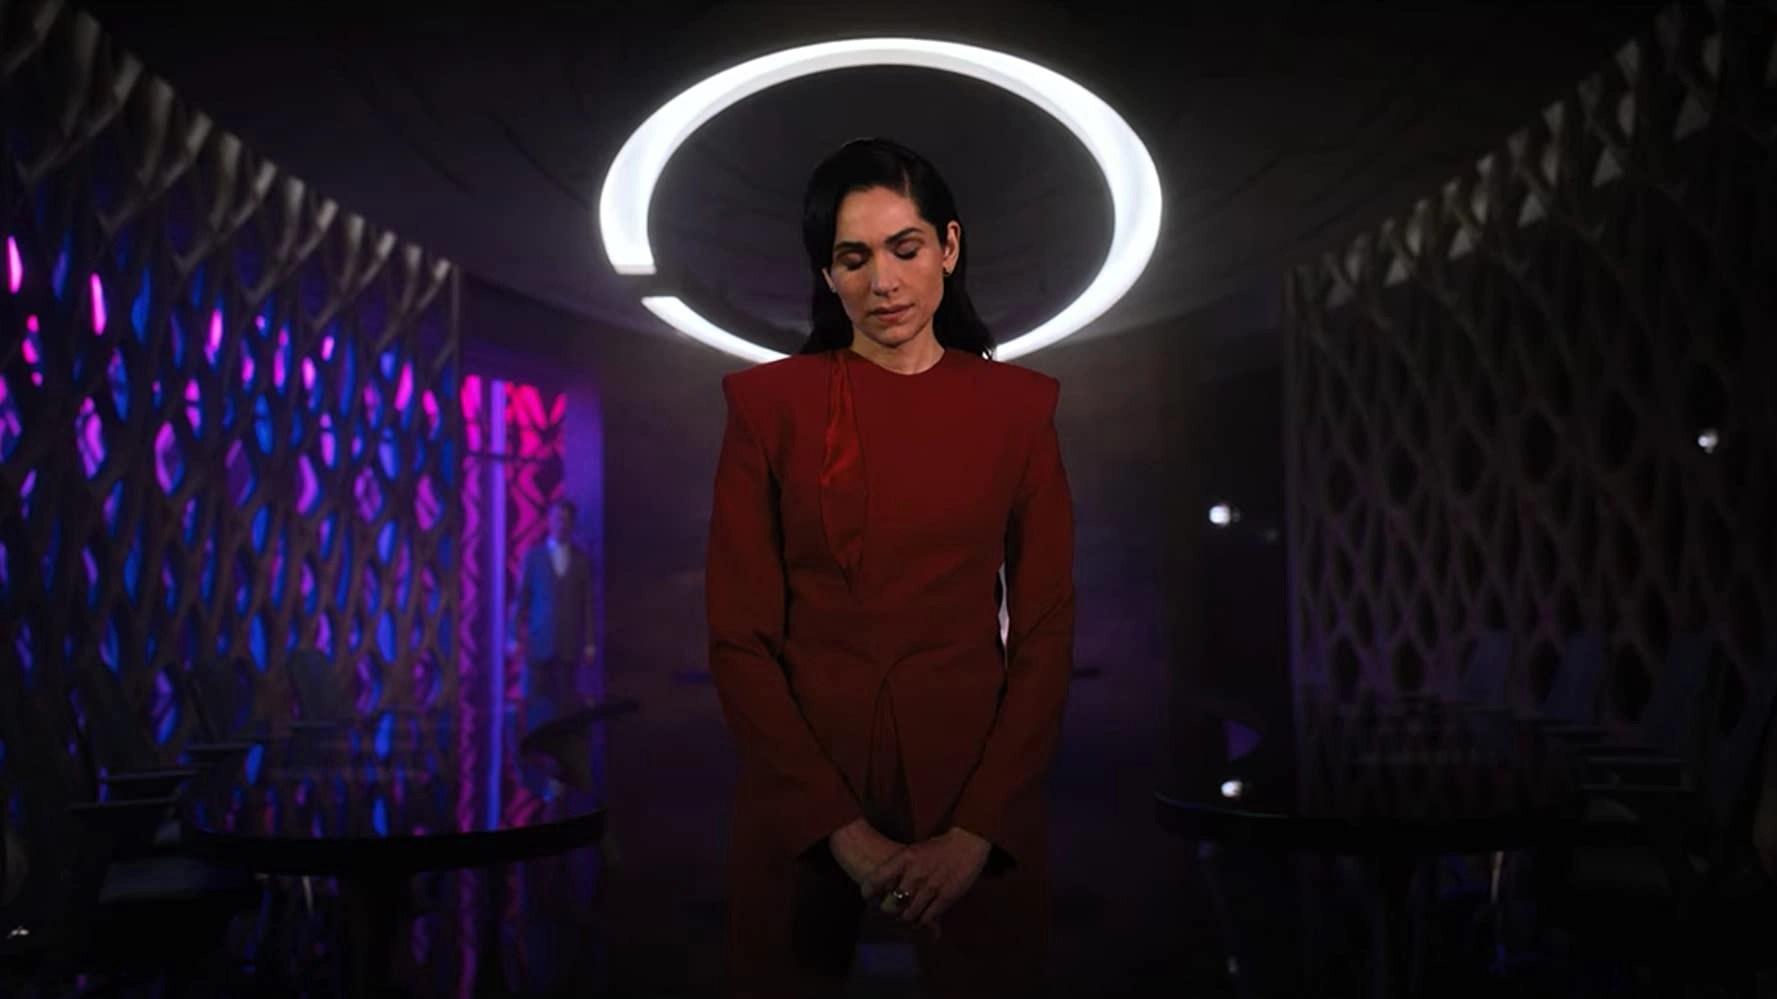 Lela Loren in Altered Carbon 2